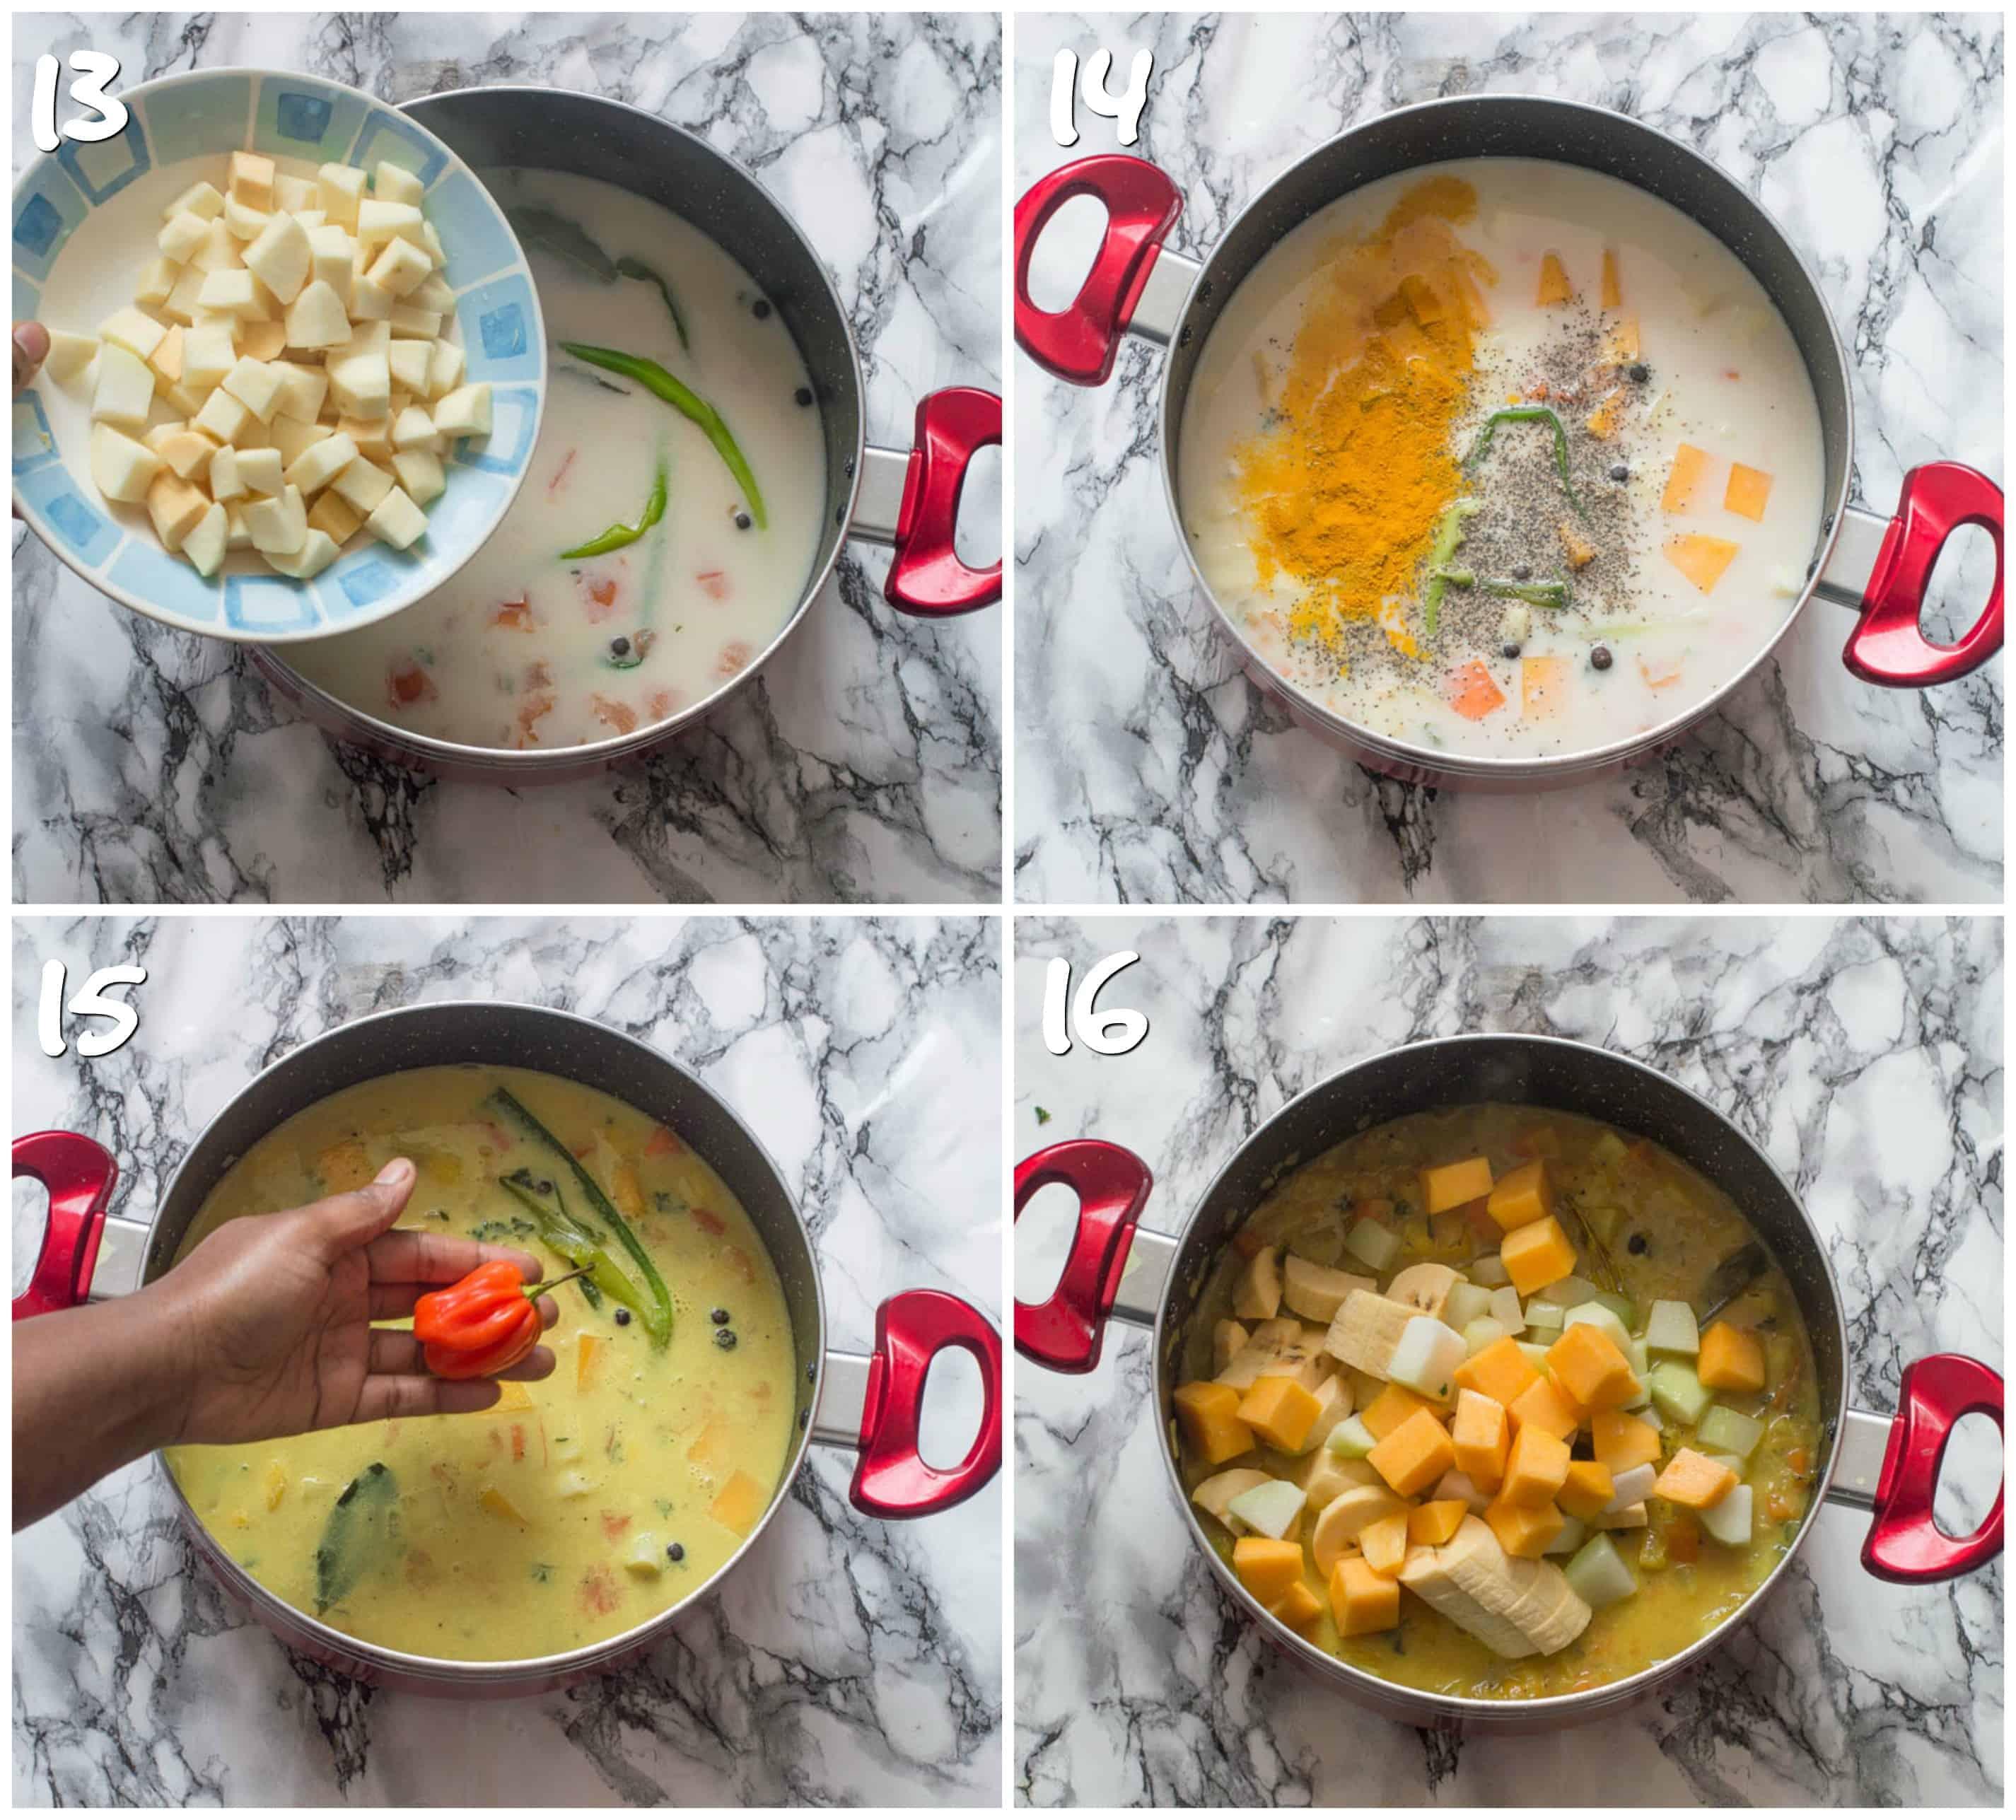 Steps 13-16 adding root veggies to saucepan